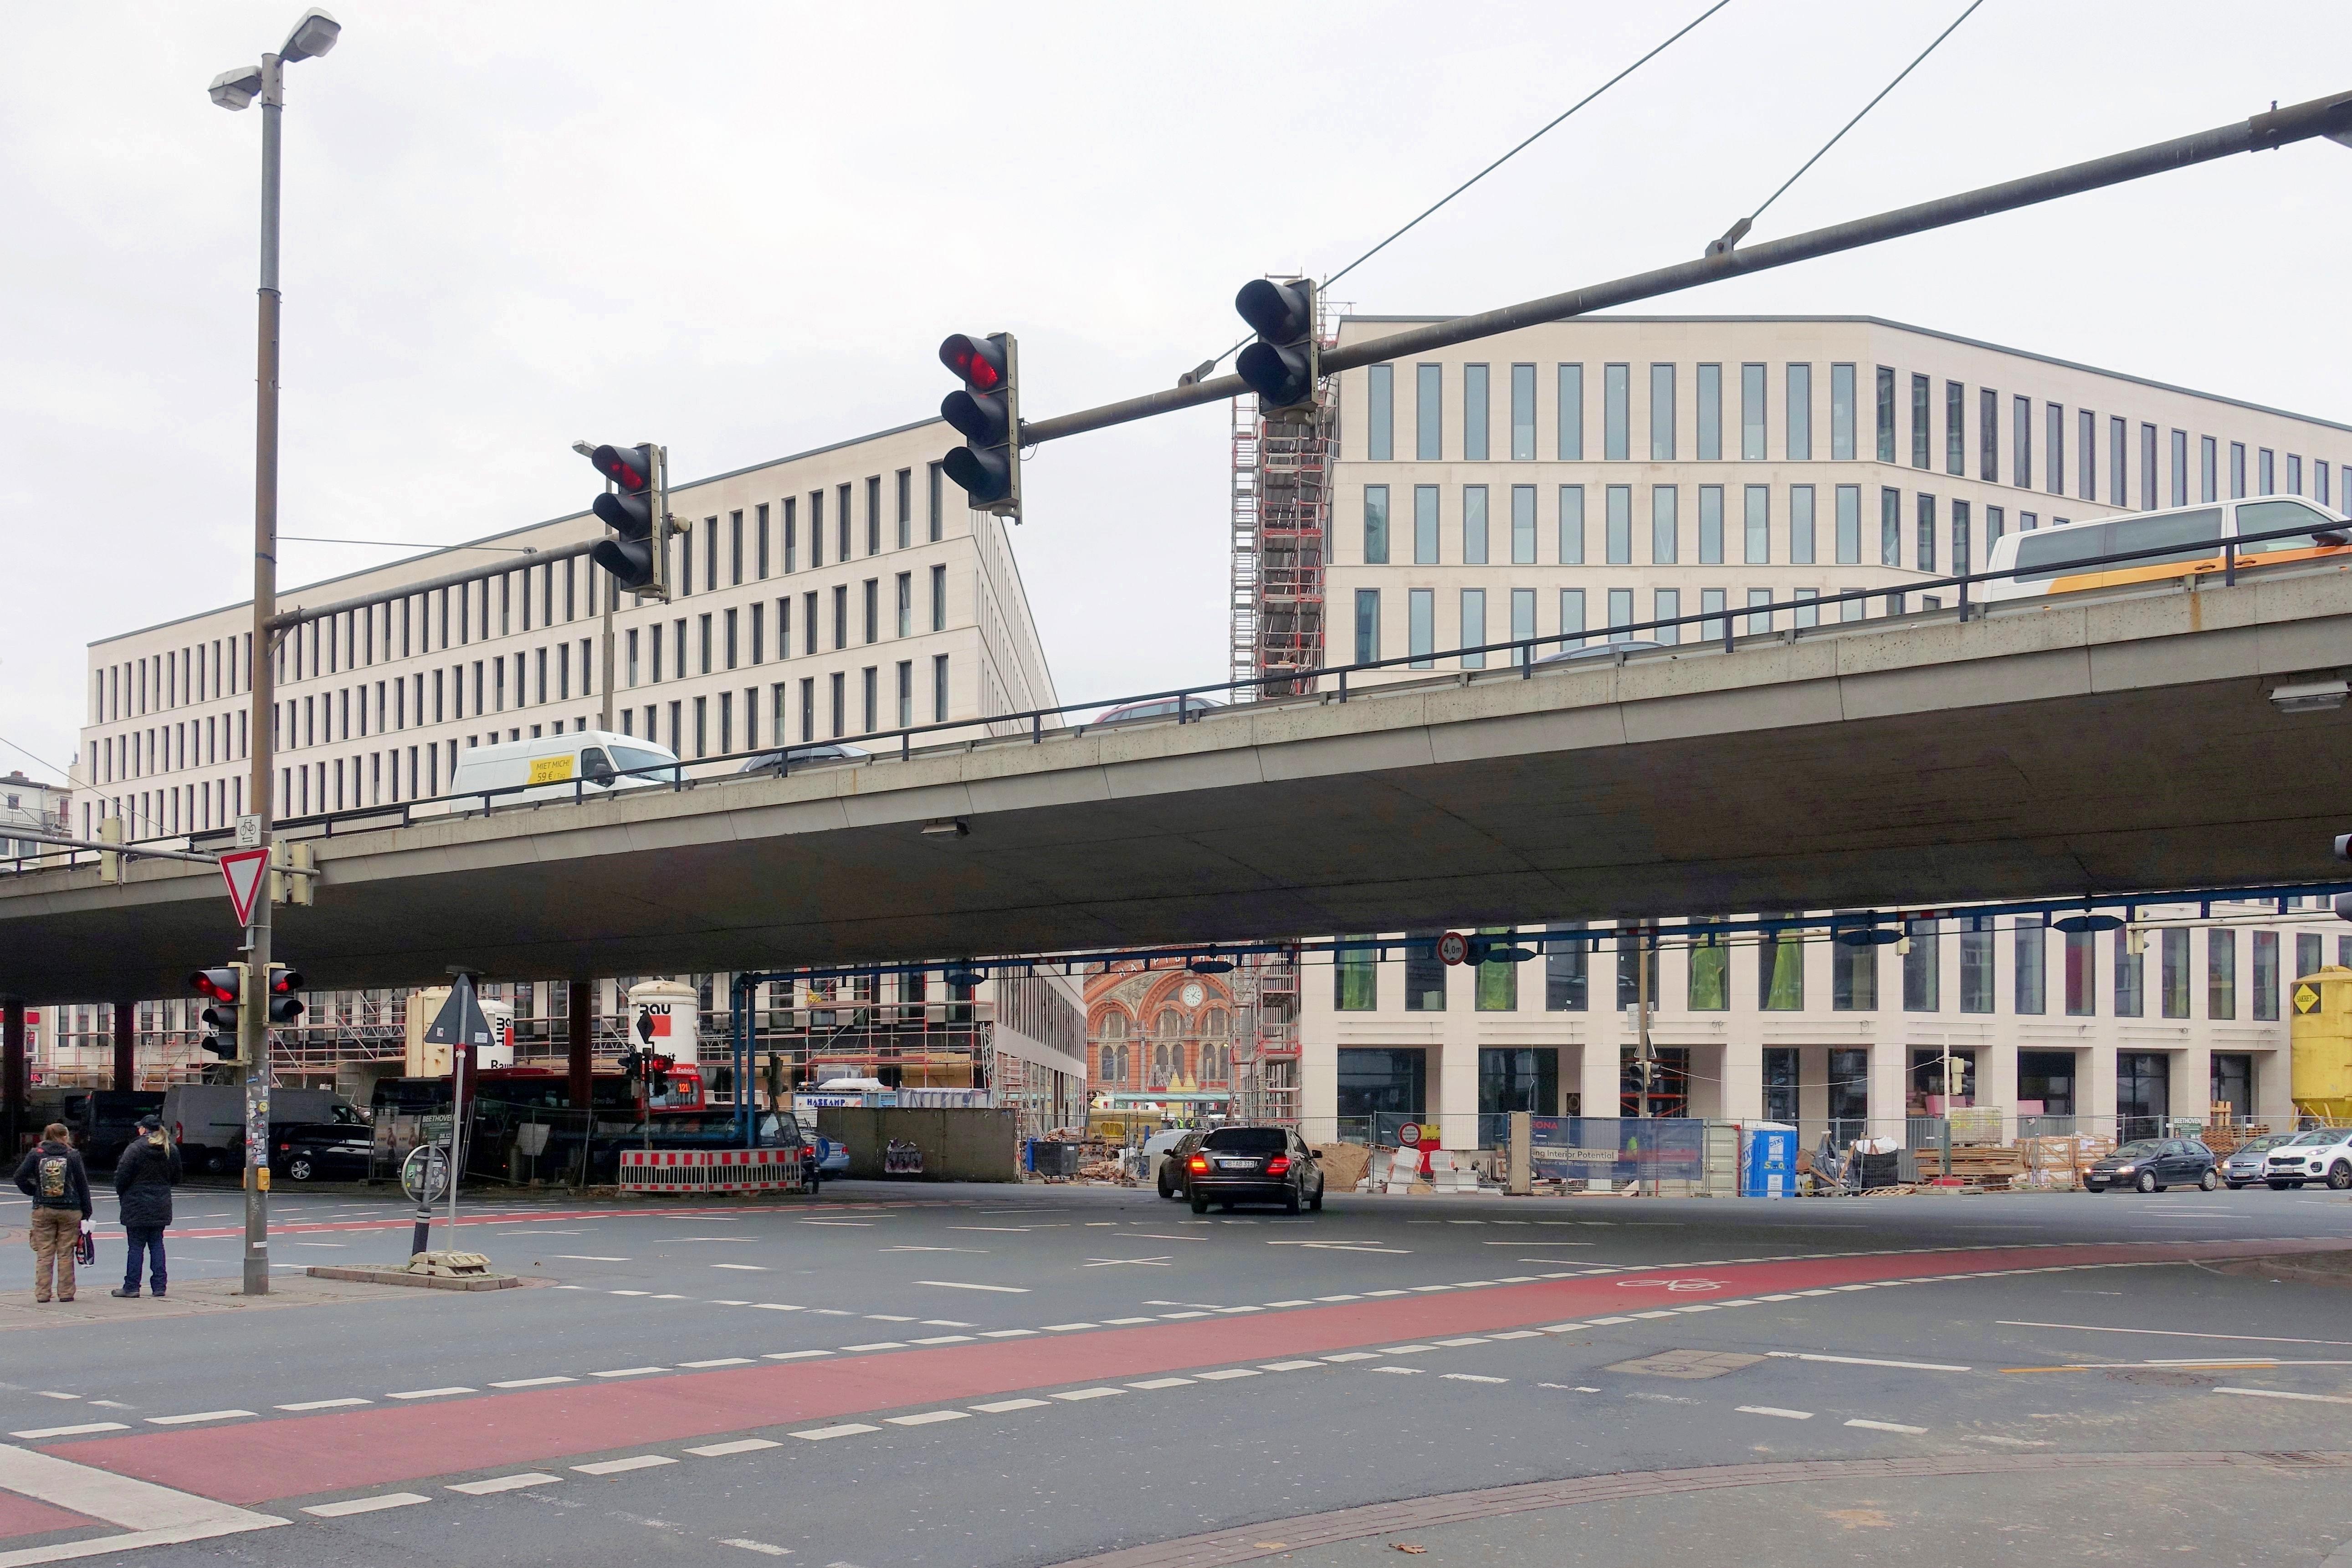 Baustelle Bahnhofsplatz 335